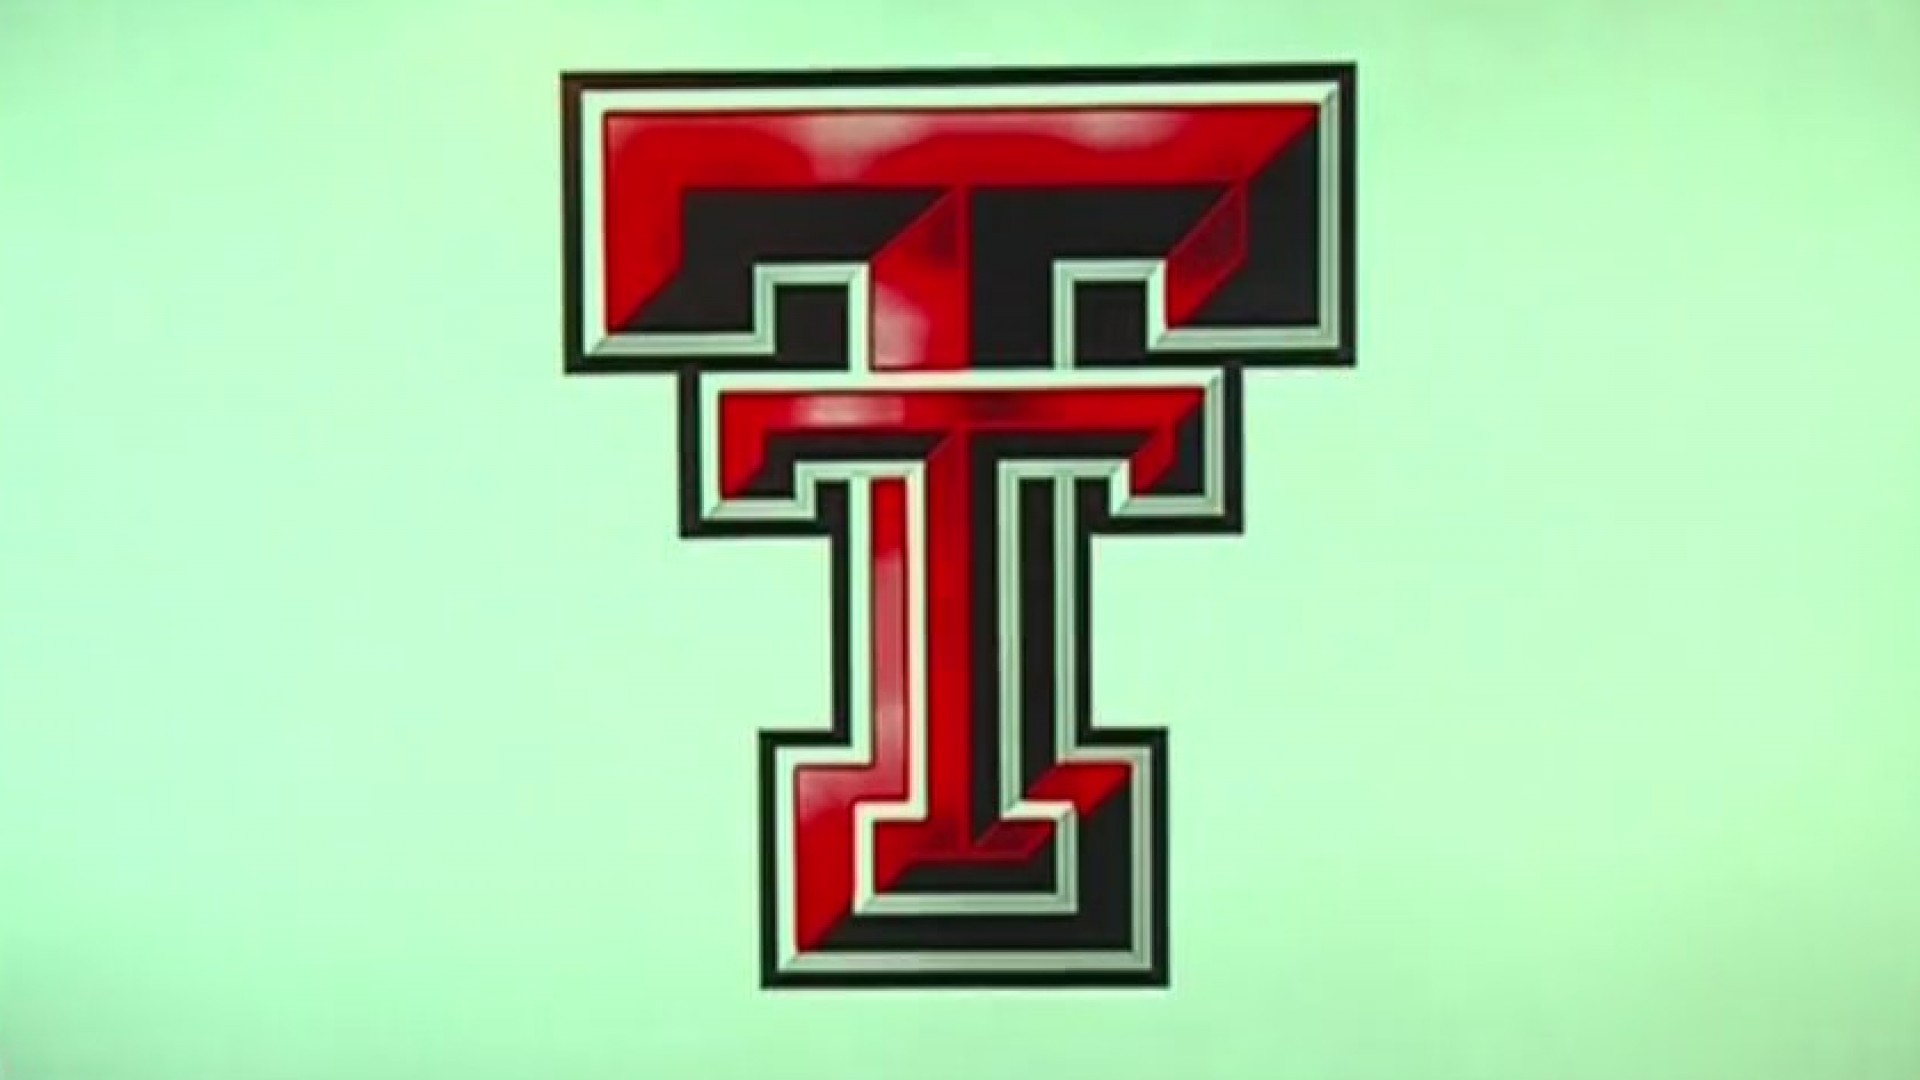 Texas_Tech_2019_NFL_Draft_Recap_0_20190429040143